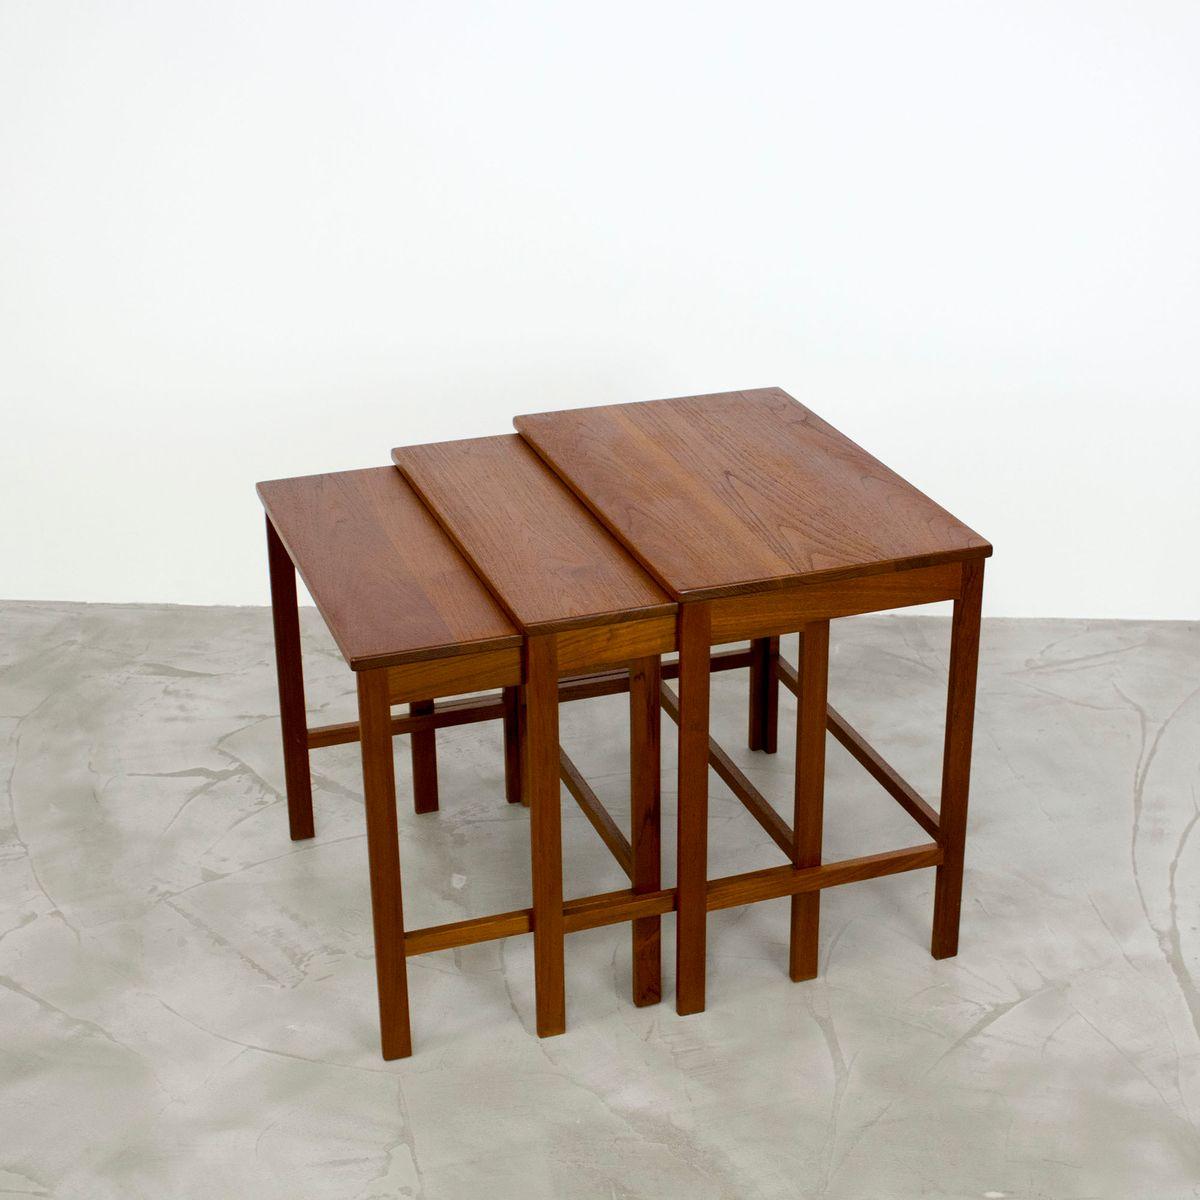 Danish Modern Teak Nesting Tables By Peter Hvidt U0026 Orla Mølgaard Nielsen  For France U0026 Søn, 1960s